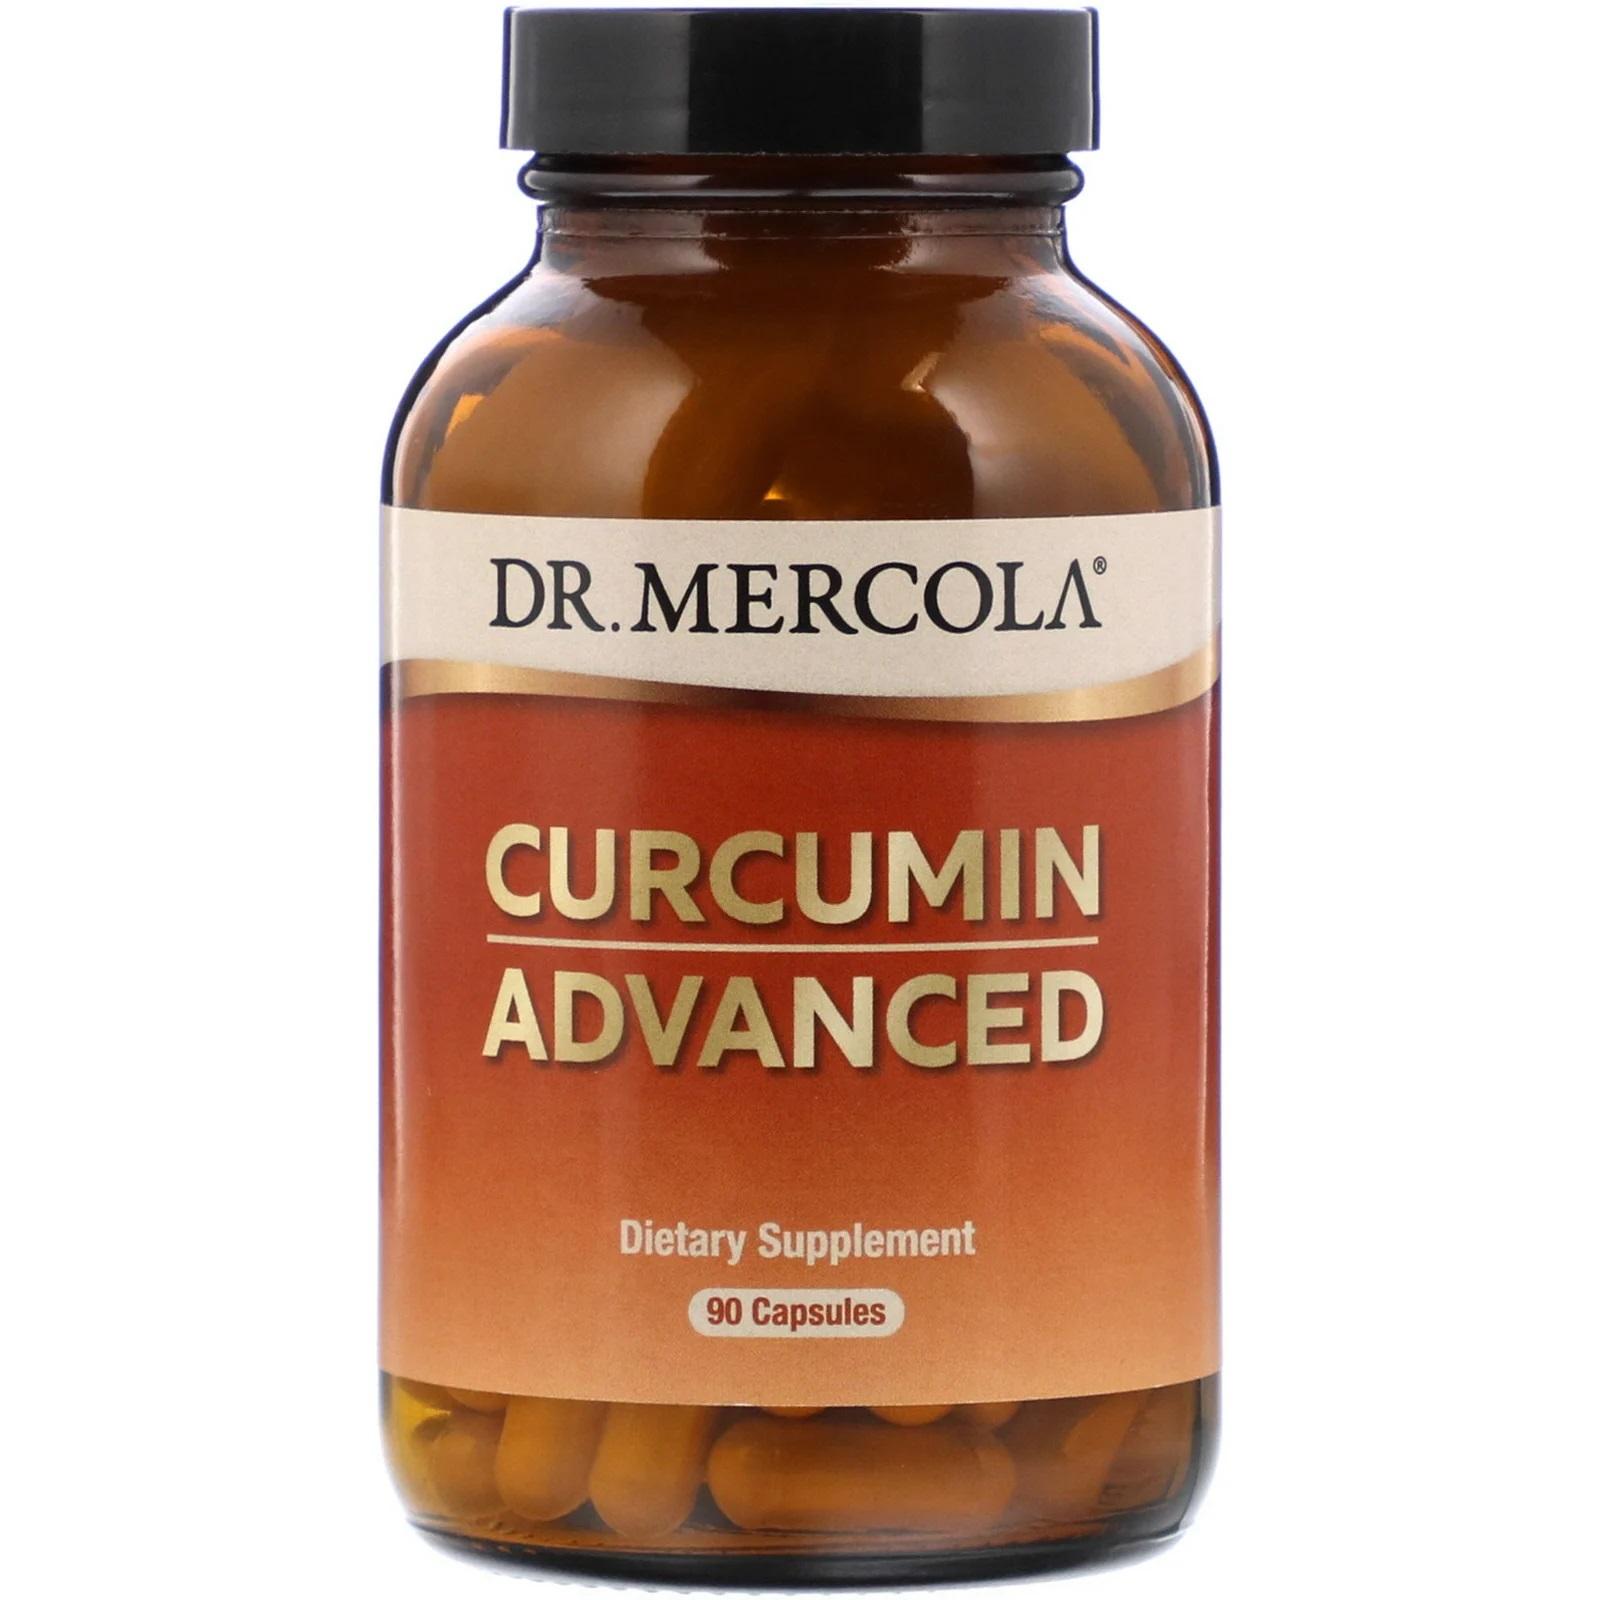 Image of Curcumin Advanced (90 Capsules) - Dr. Mercola 0813006016810